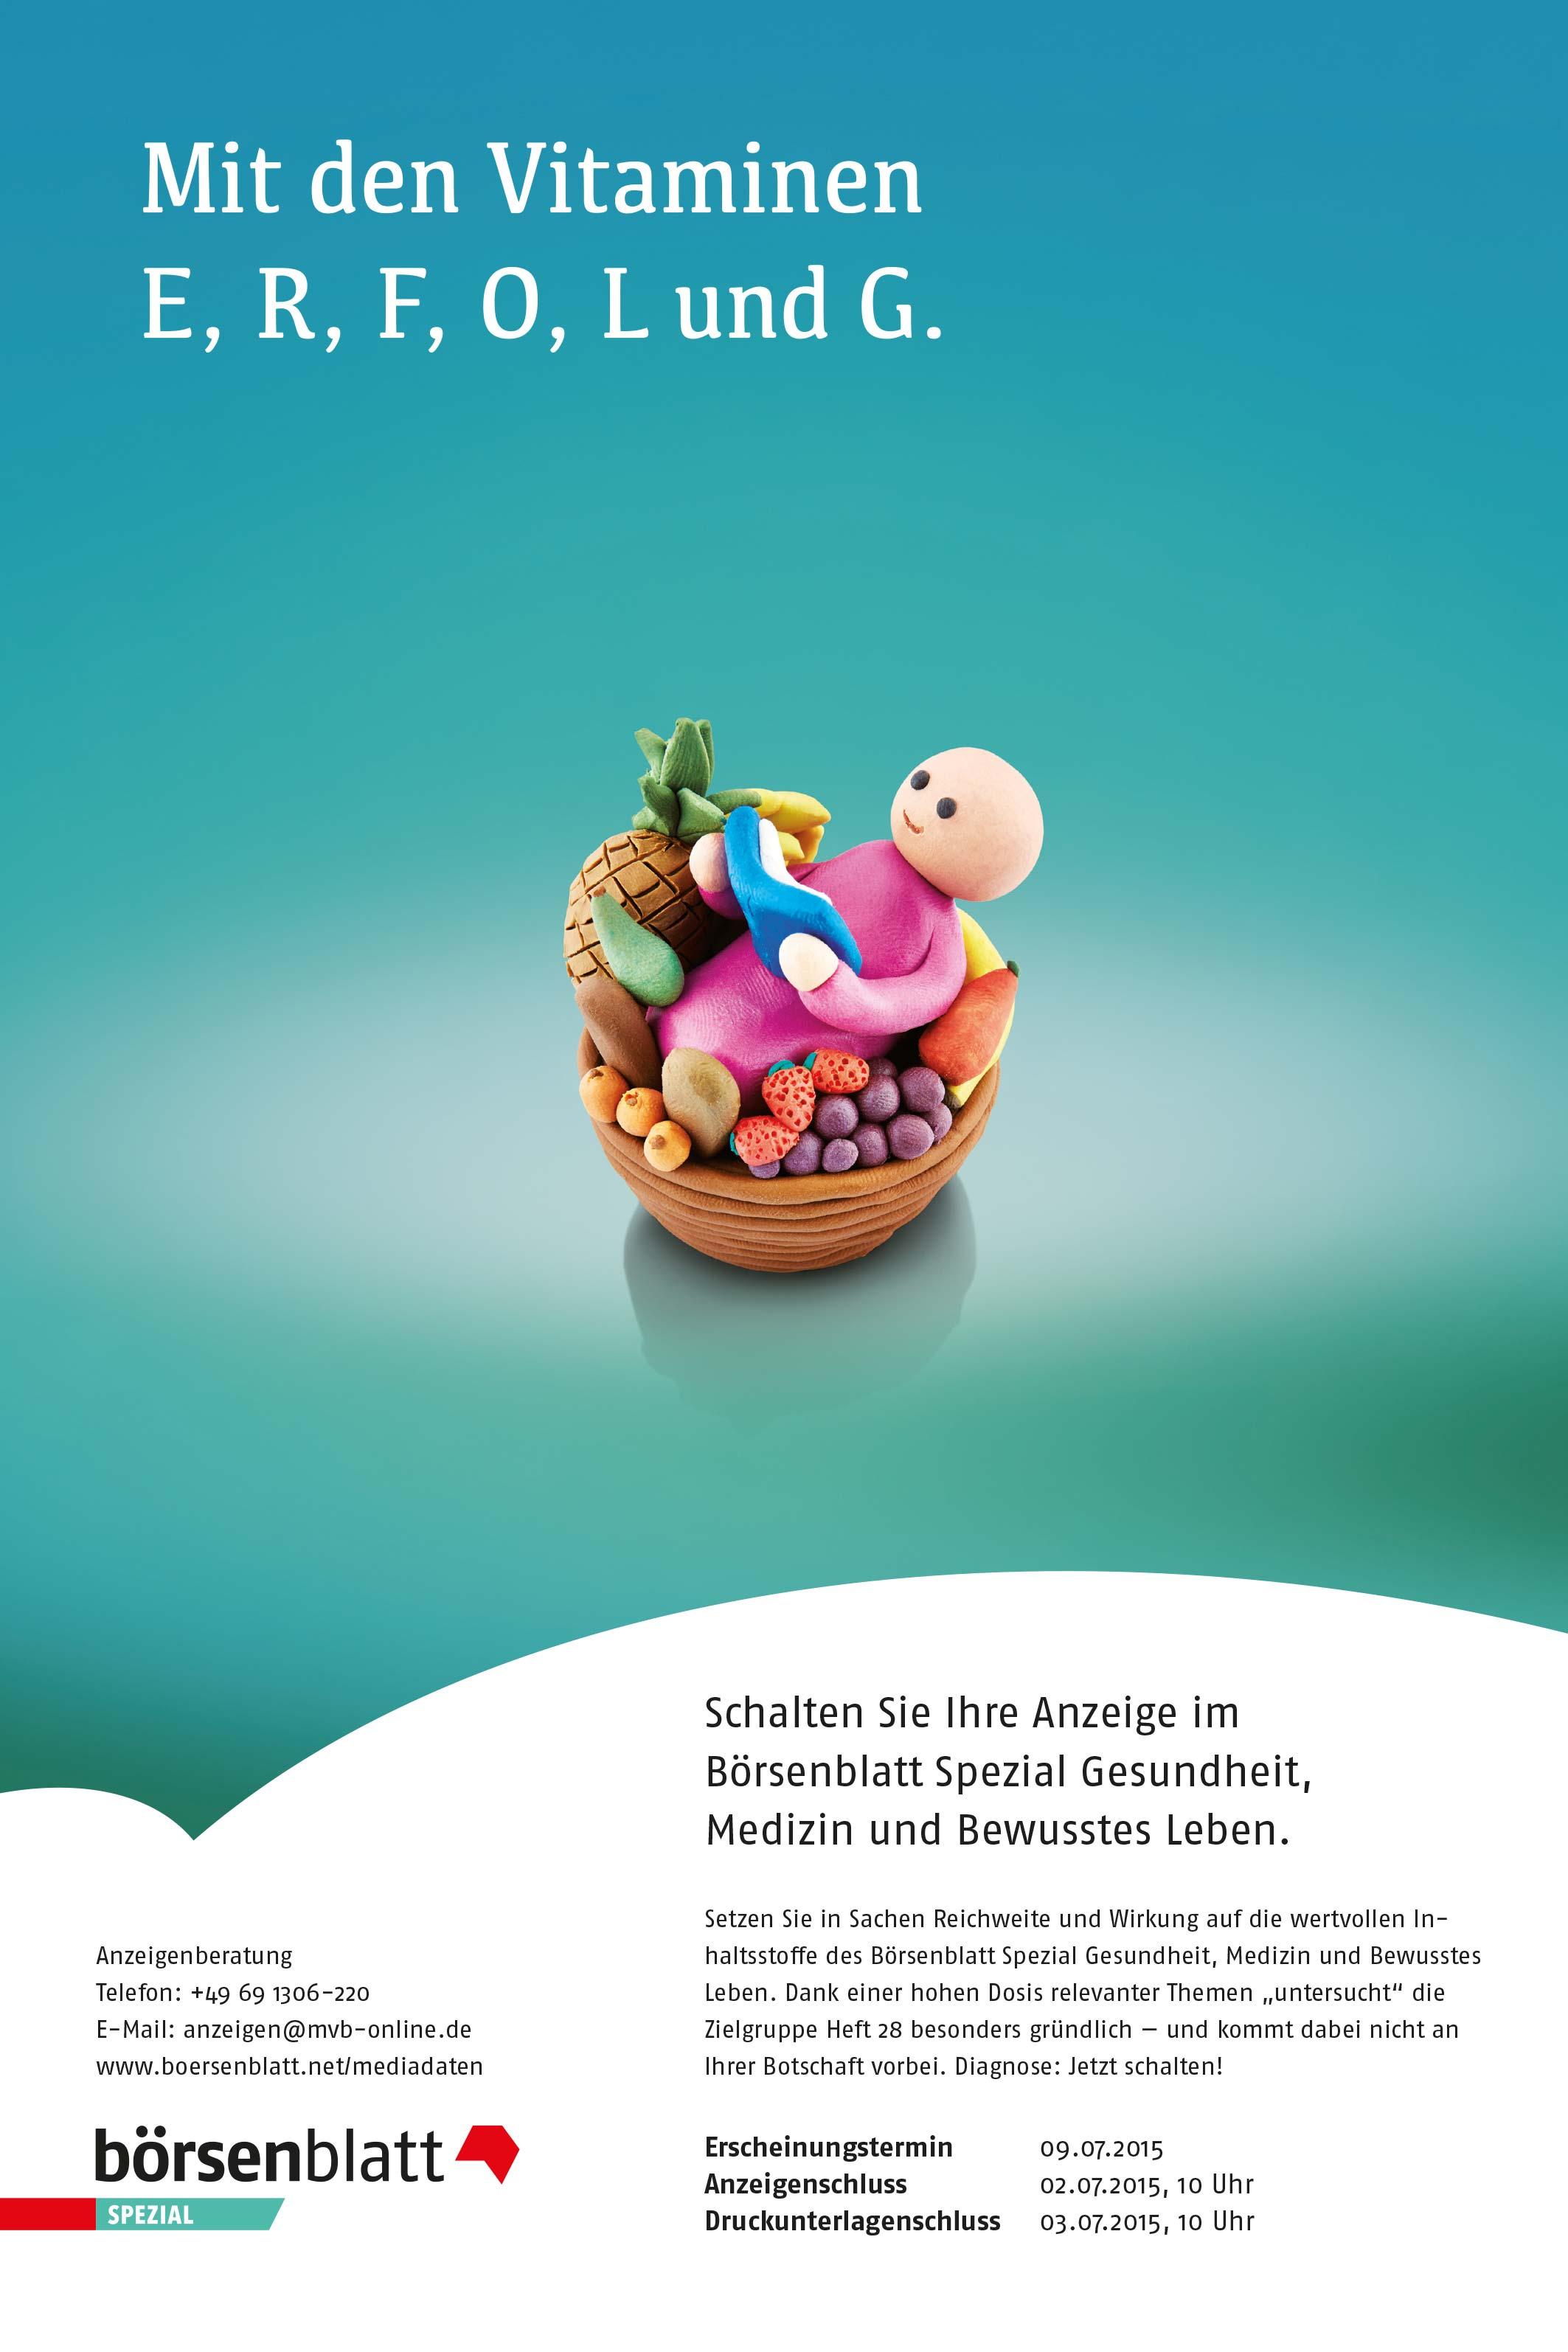 Anzeigenserie_Knetfiguren_Börsenblatt_Spezial_Medizin_Gesundheit